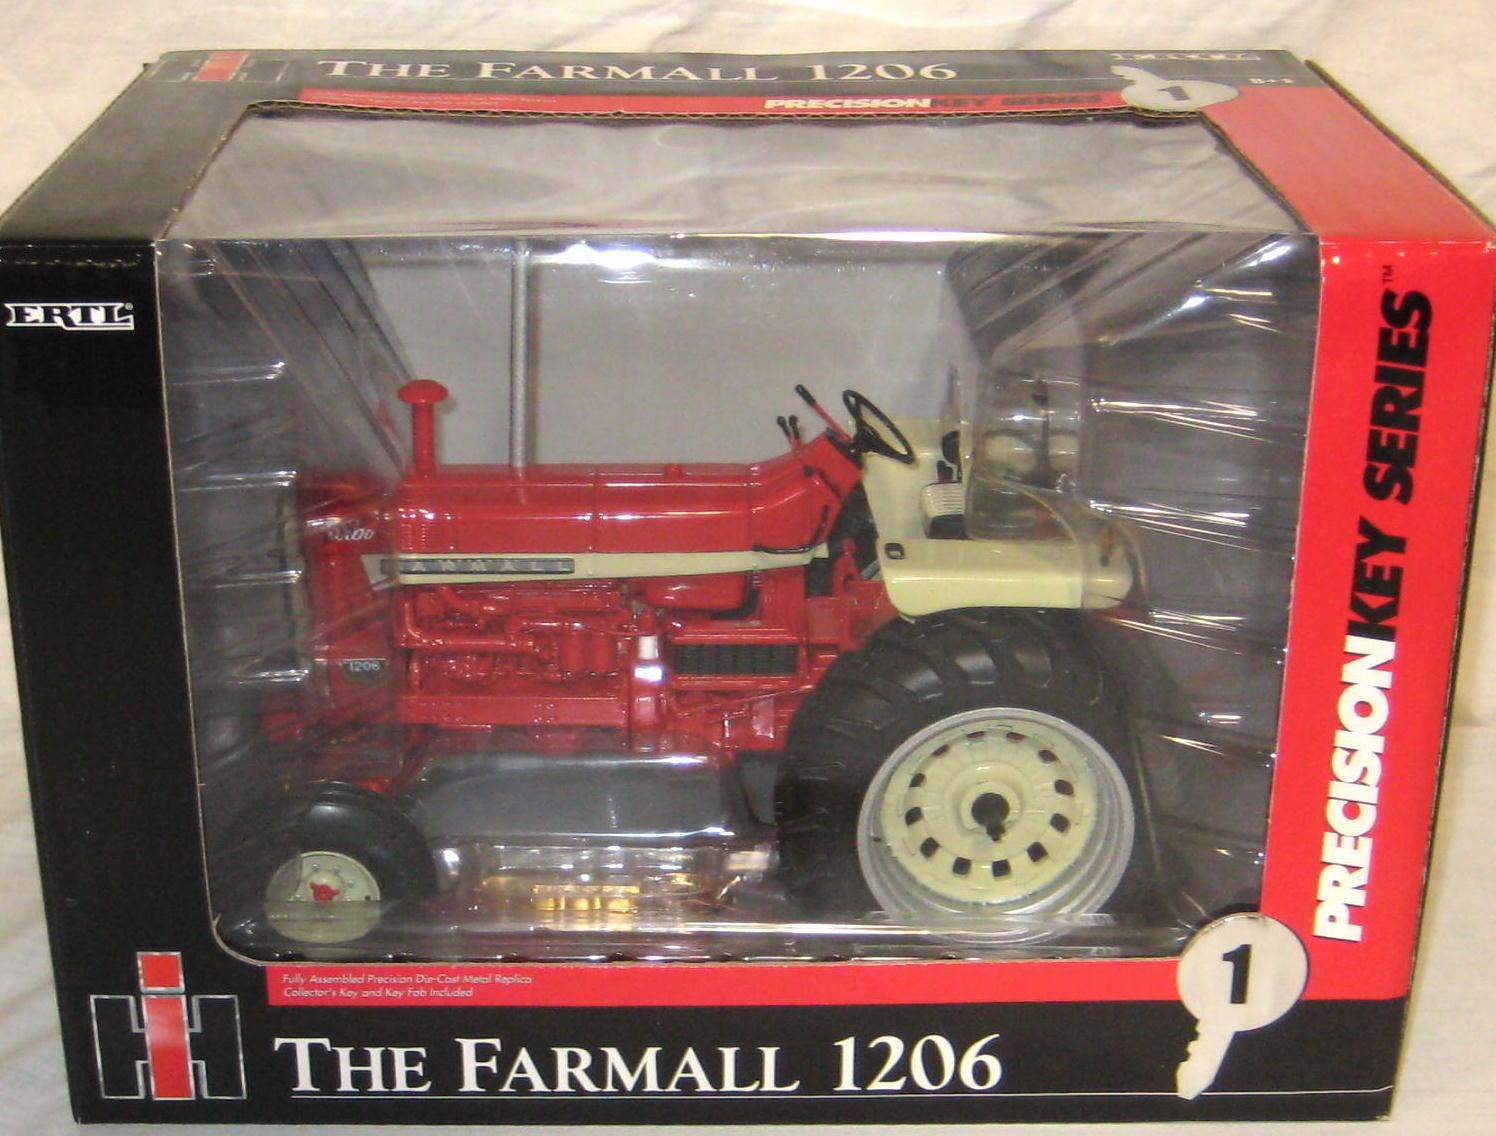 Farm Toy Auction 1206 International Tractor Wiring Jan 2016 Toys 133 224439 Bytes